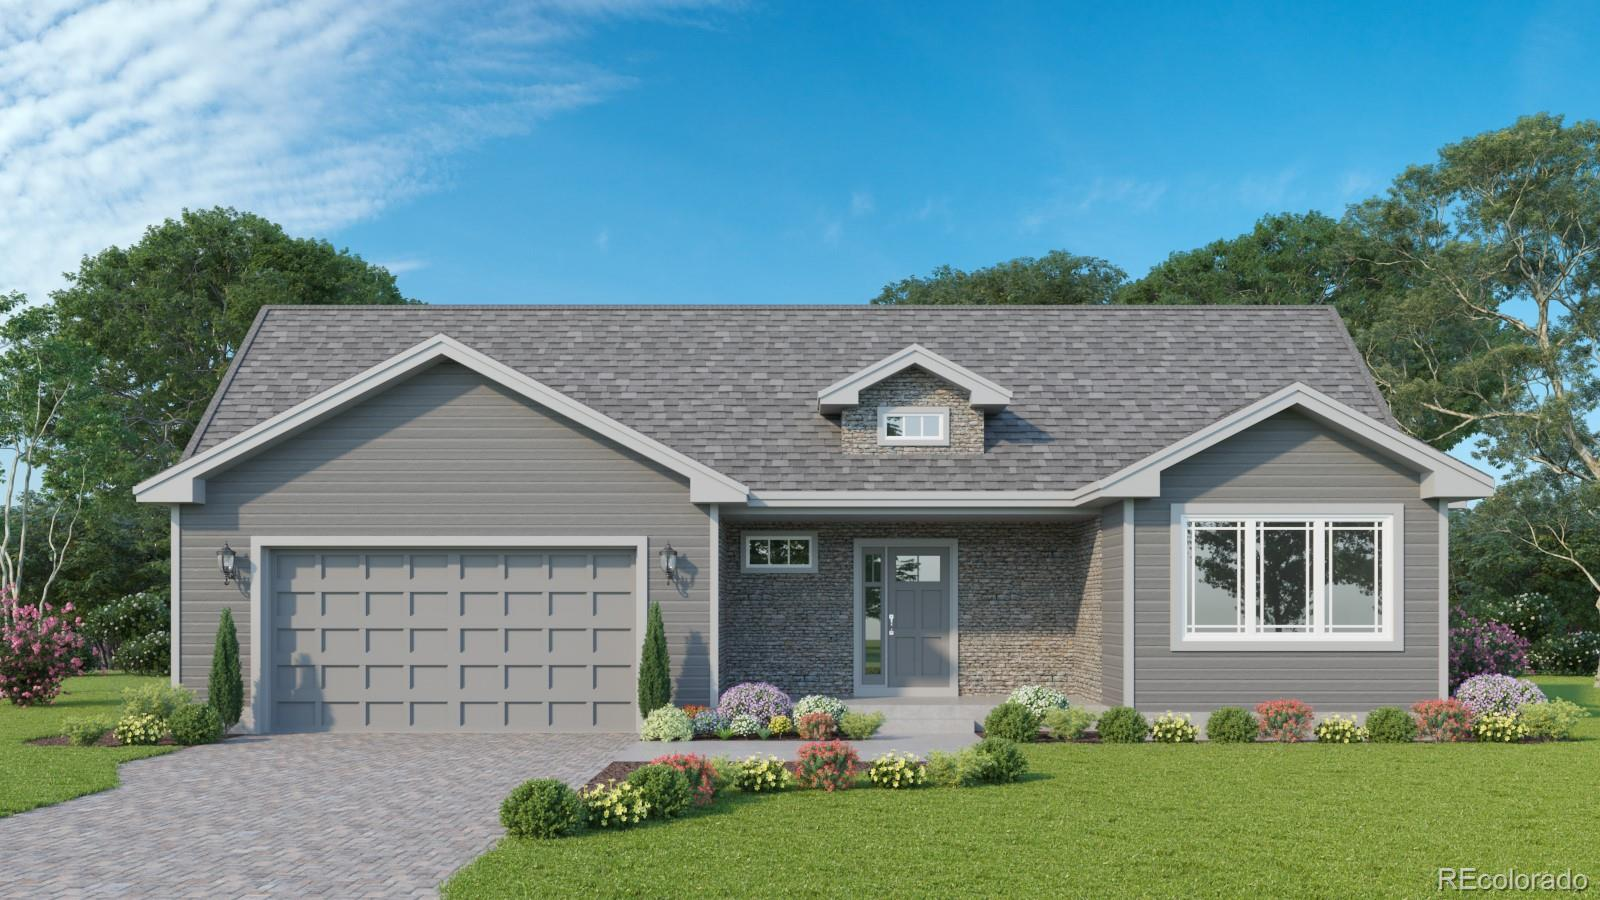 39125 E. 145th Court, Keenesburg, CO 80643 - Keenesburg, CO real estate listing